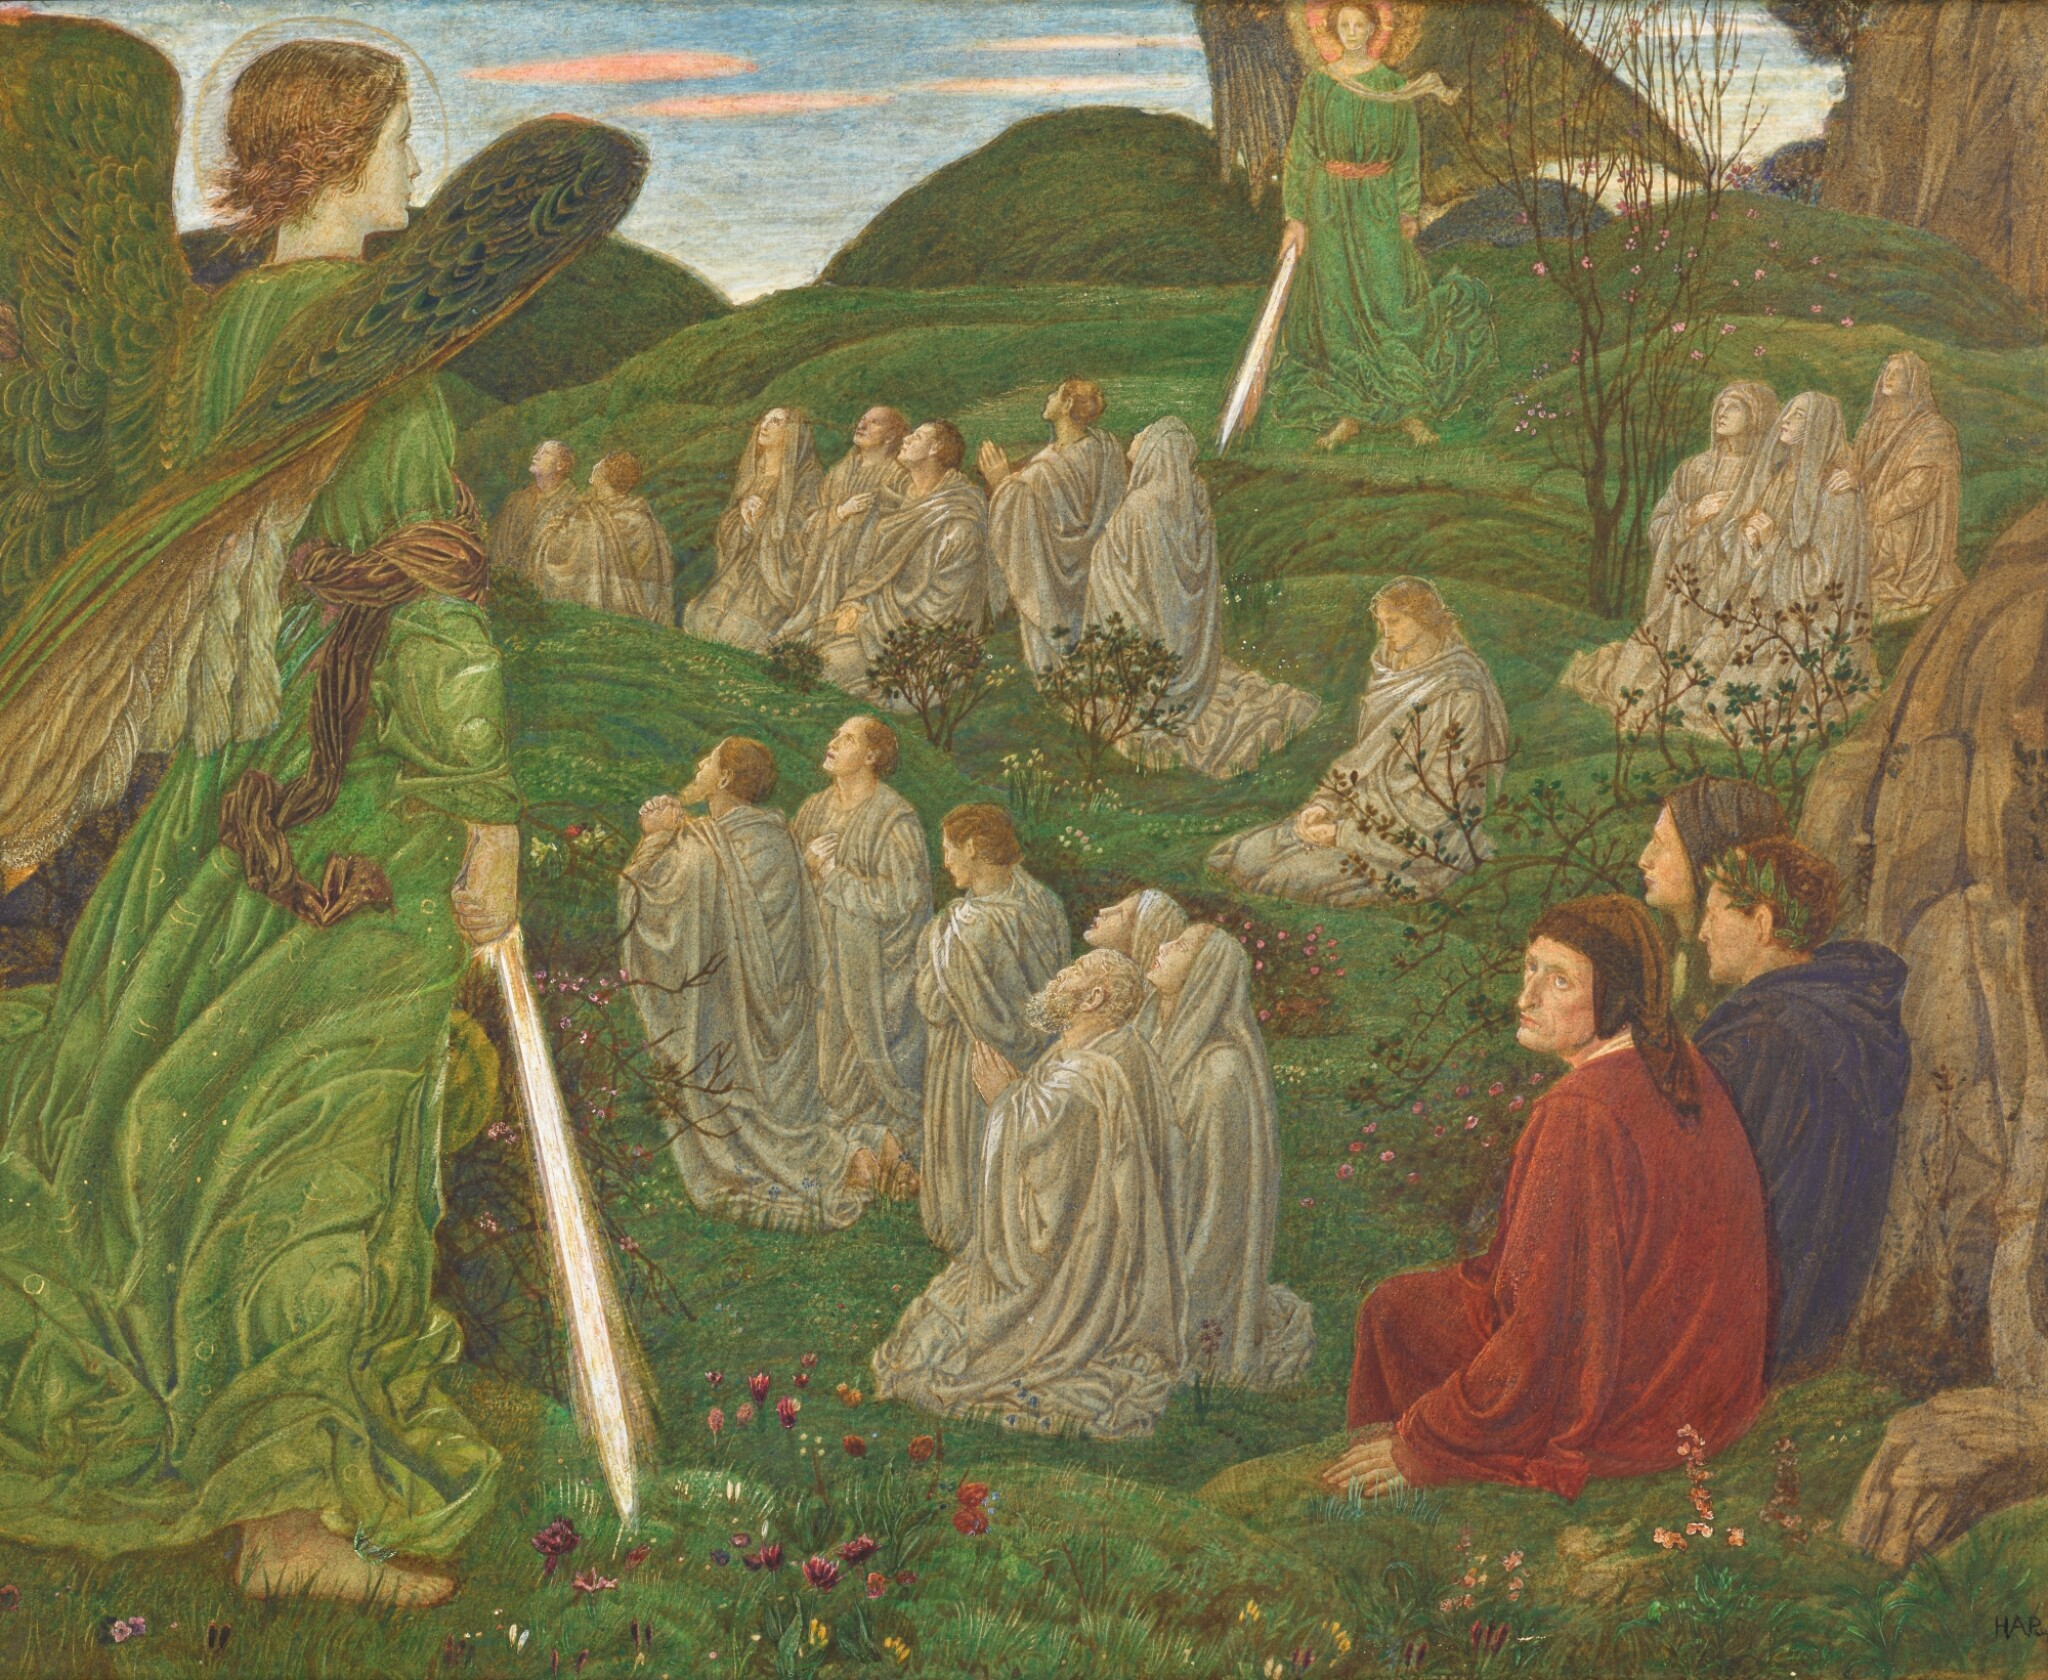 HENRY ARTHUR PAYNE | THE GREEN VALLEY, PURGATORIO CANTOS VII-VIII